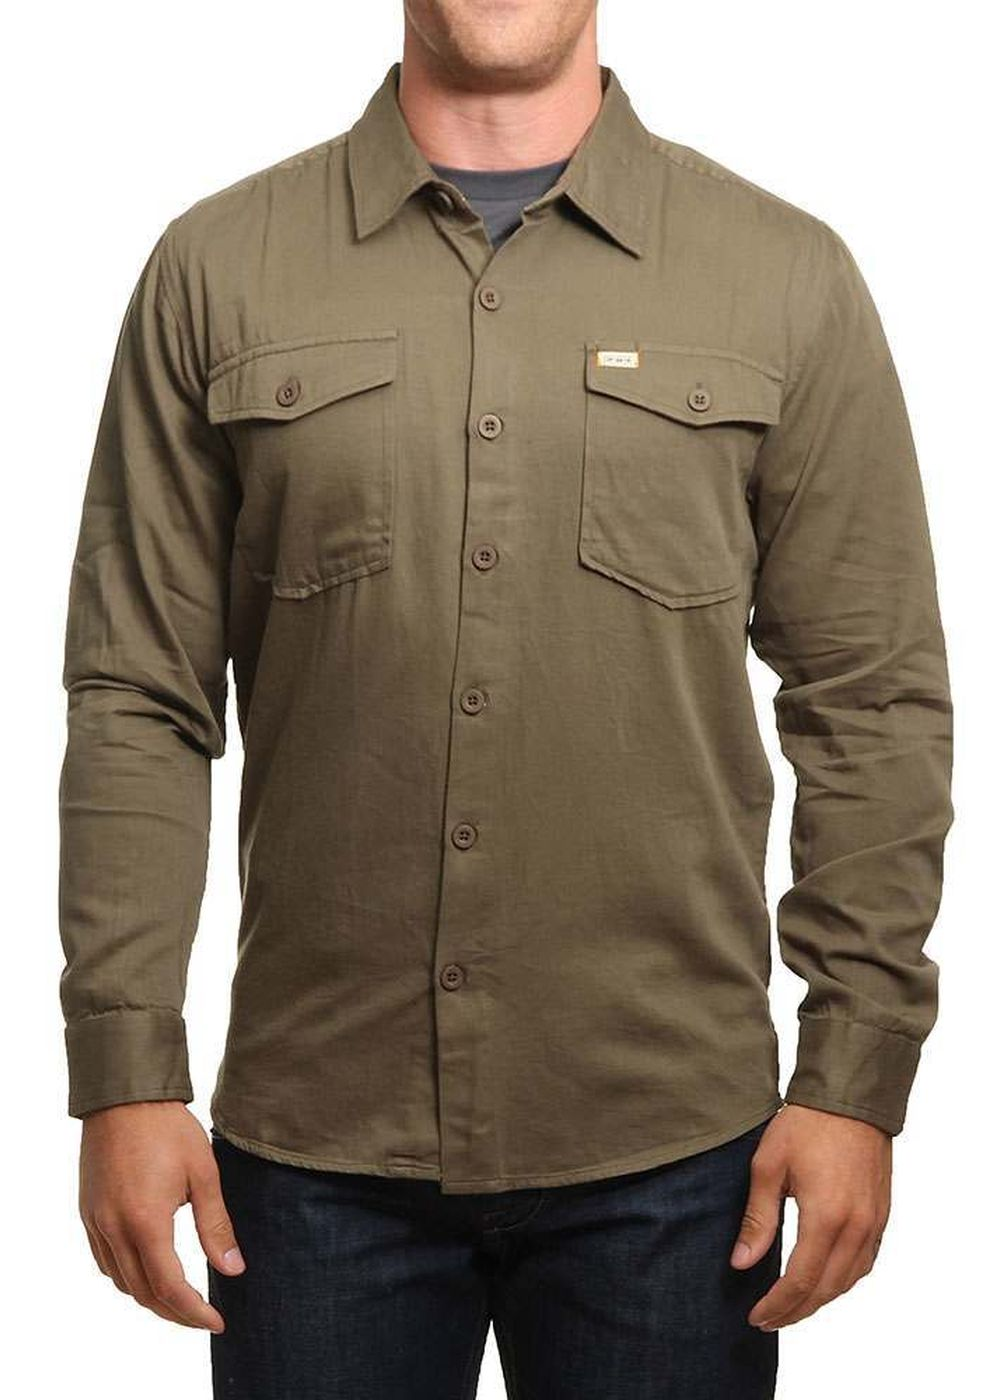 captain-fin-si-senior-shirt-olive